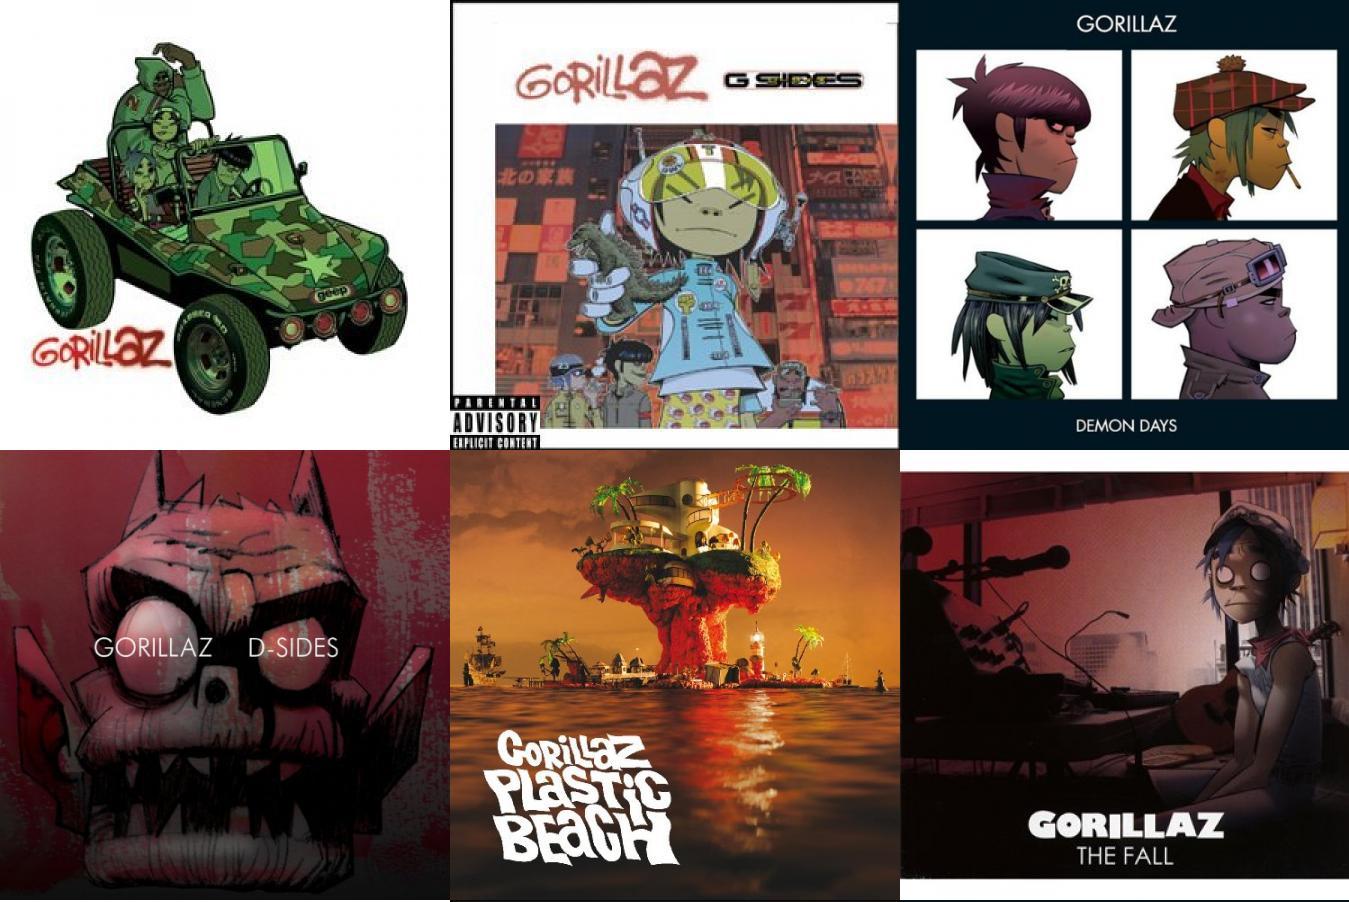 Gorillaz the fall wallpaper - photo#24